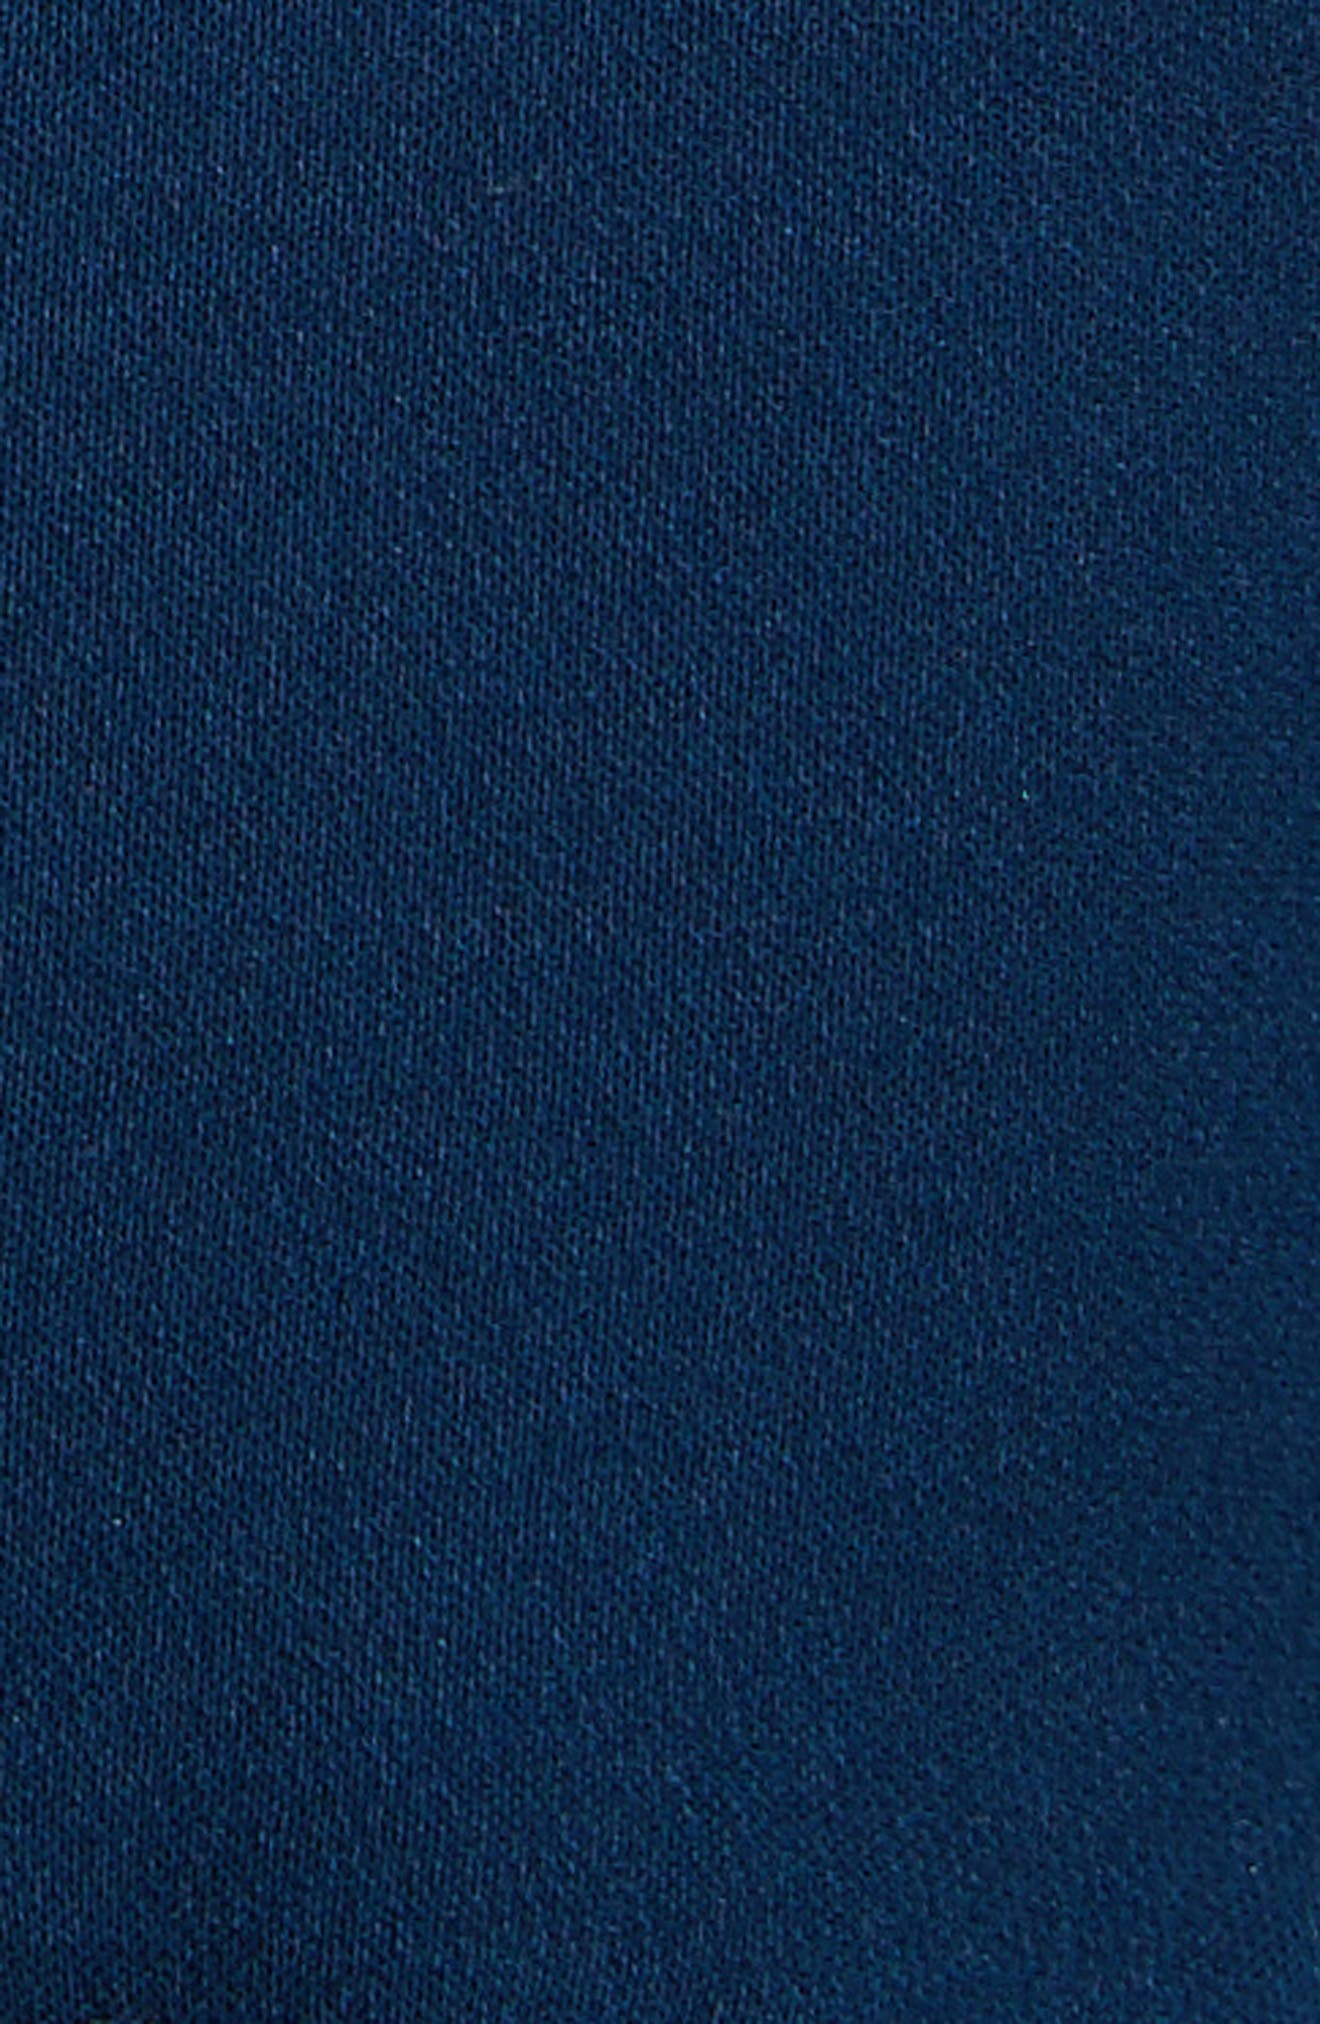 Taghrid Ruffle Silk Dress,                             Alternate thumbnail 5, color,                             Lapis